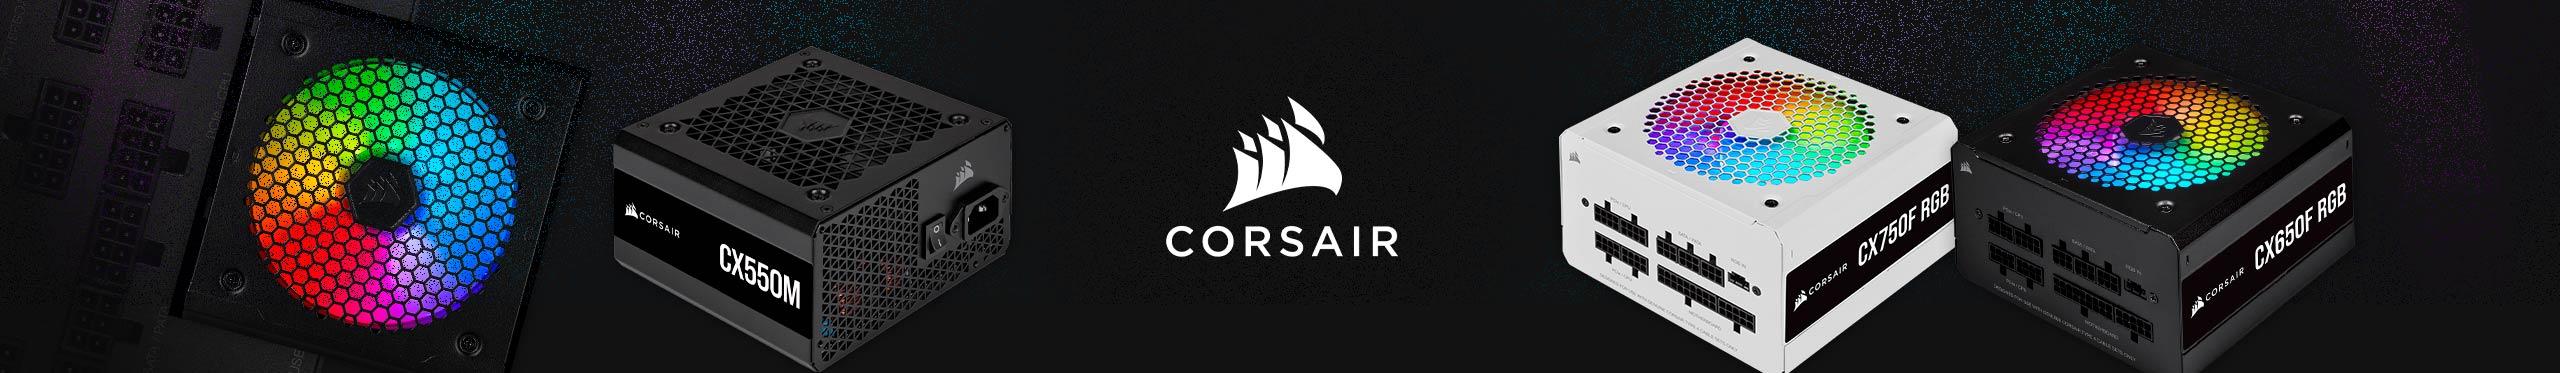 Energia eficiente para seu PC é só com as Fontes Corsair.